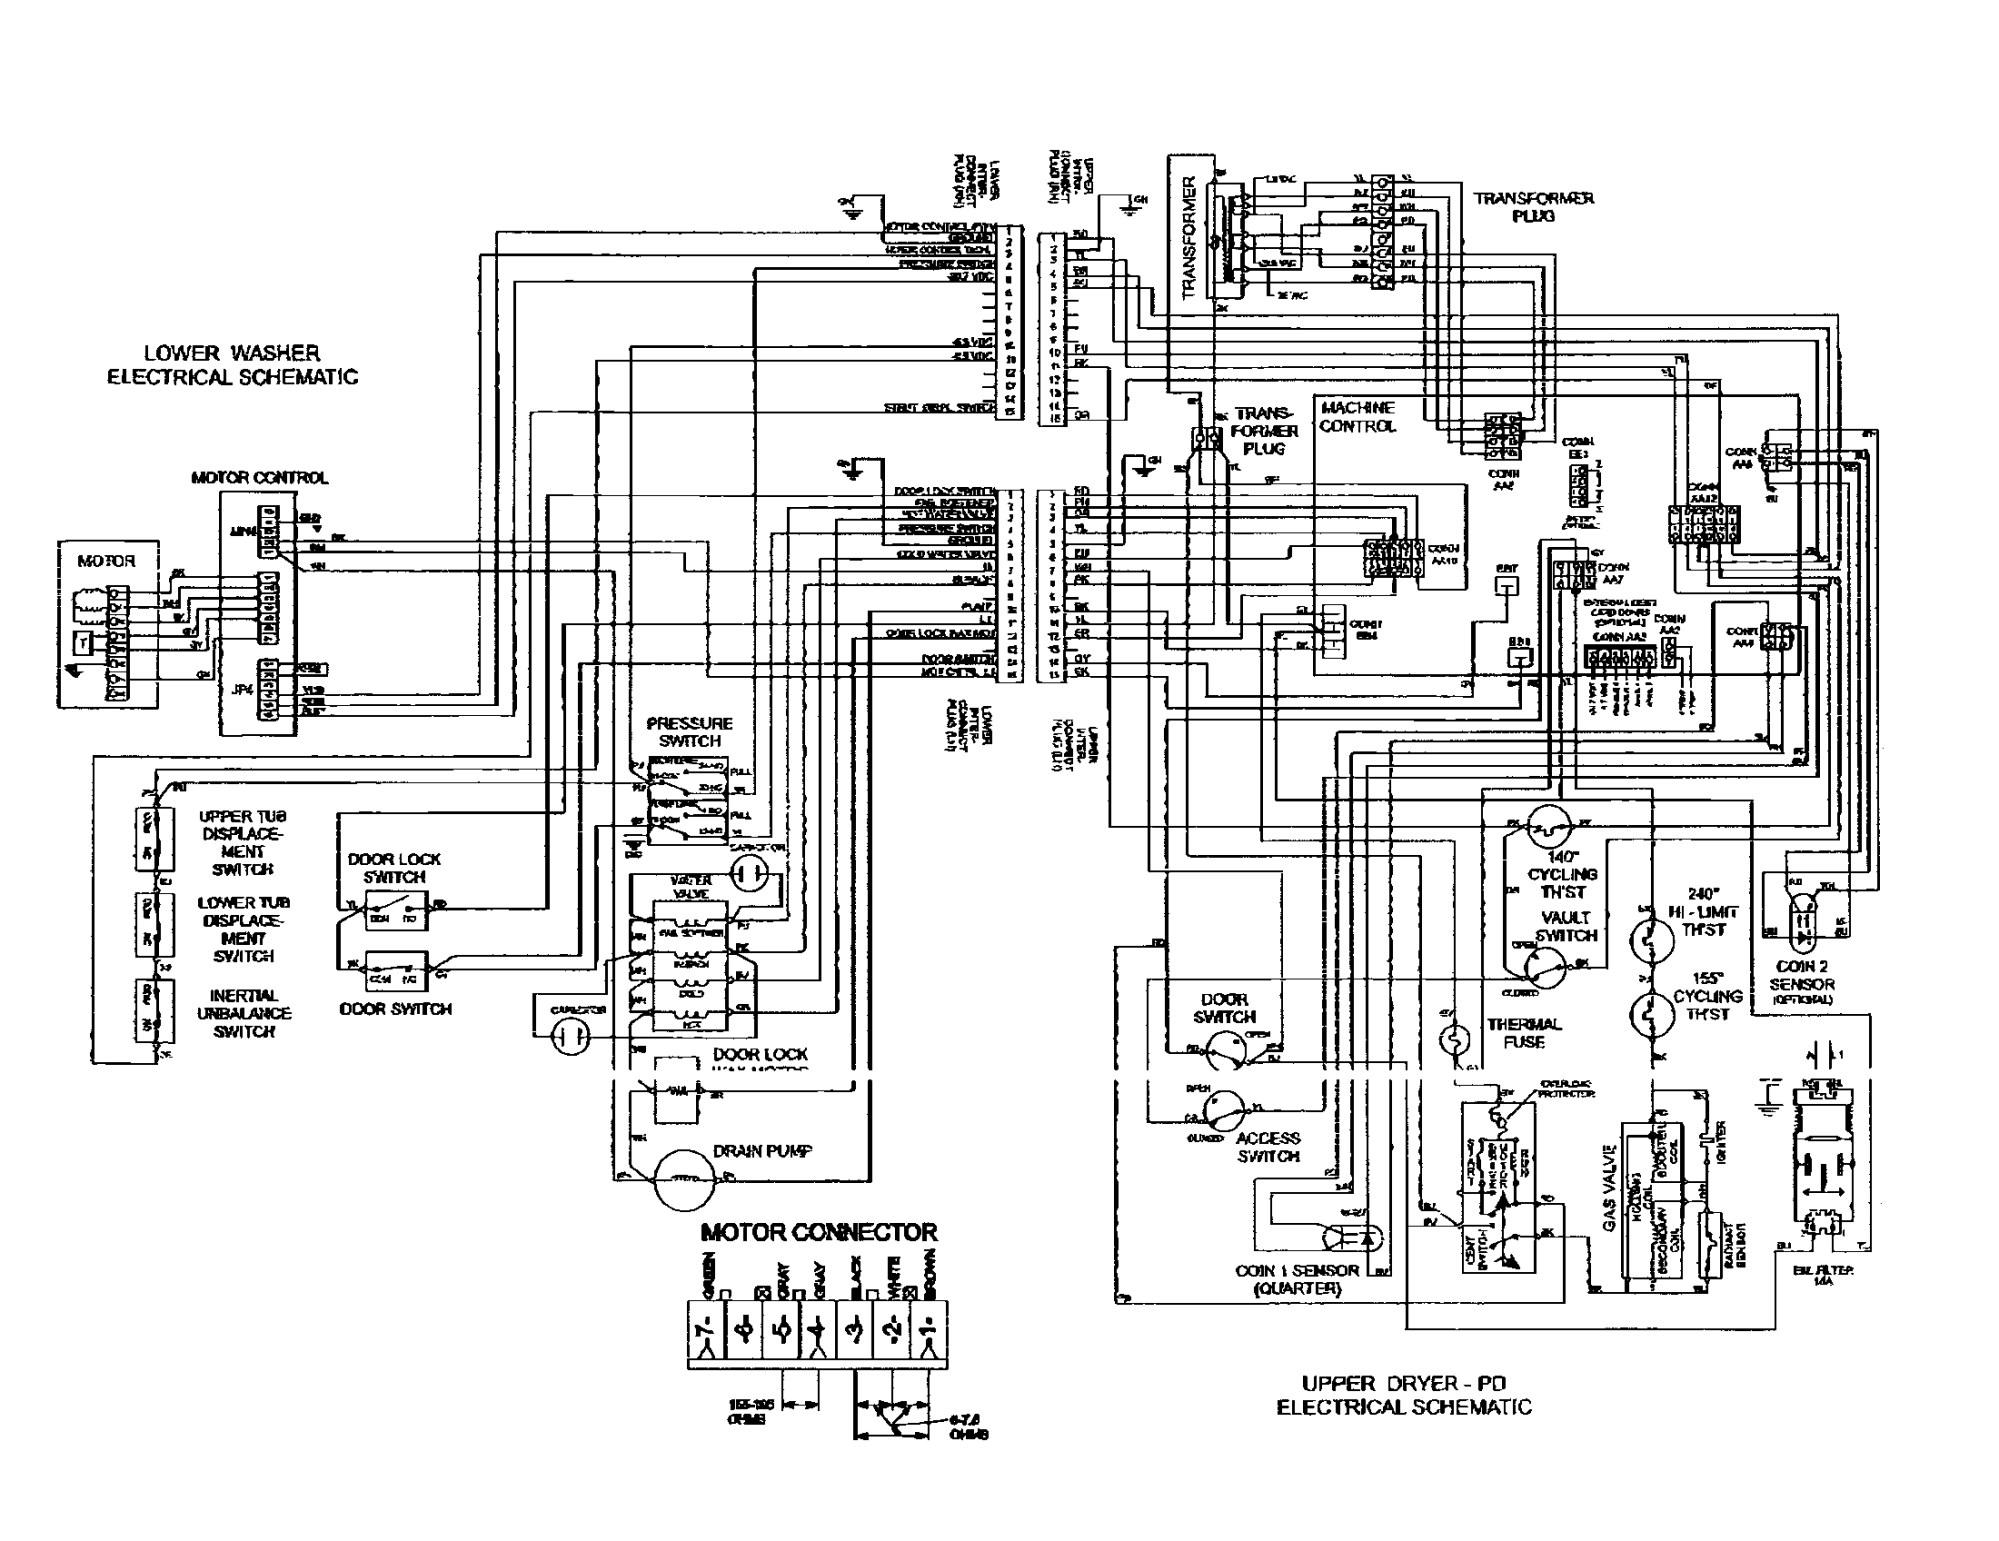 hight resolution of maytag schematic diagram wiring diagram expertmaytag washer wiring diagram wiring diagram yer maytag schematic diagram